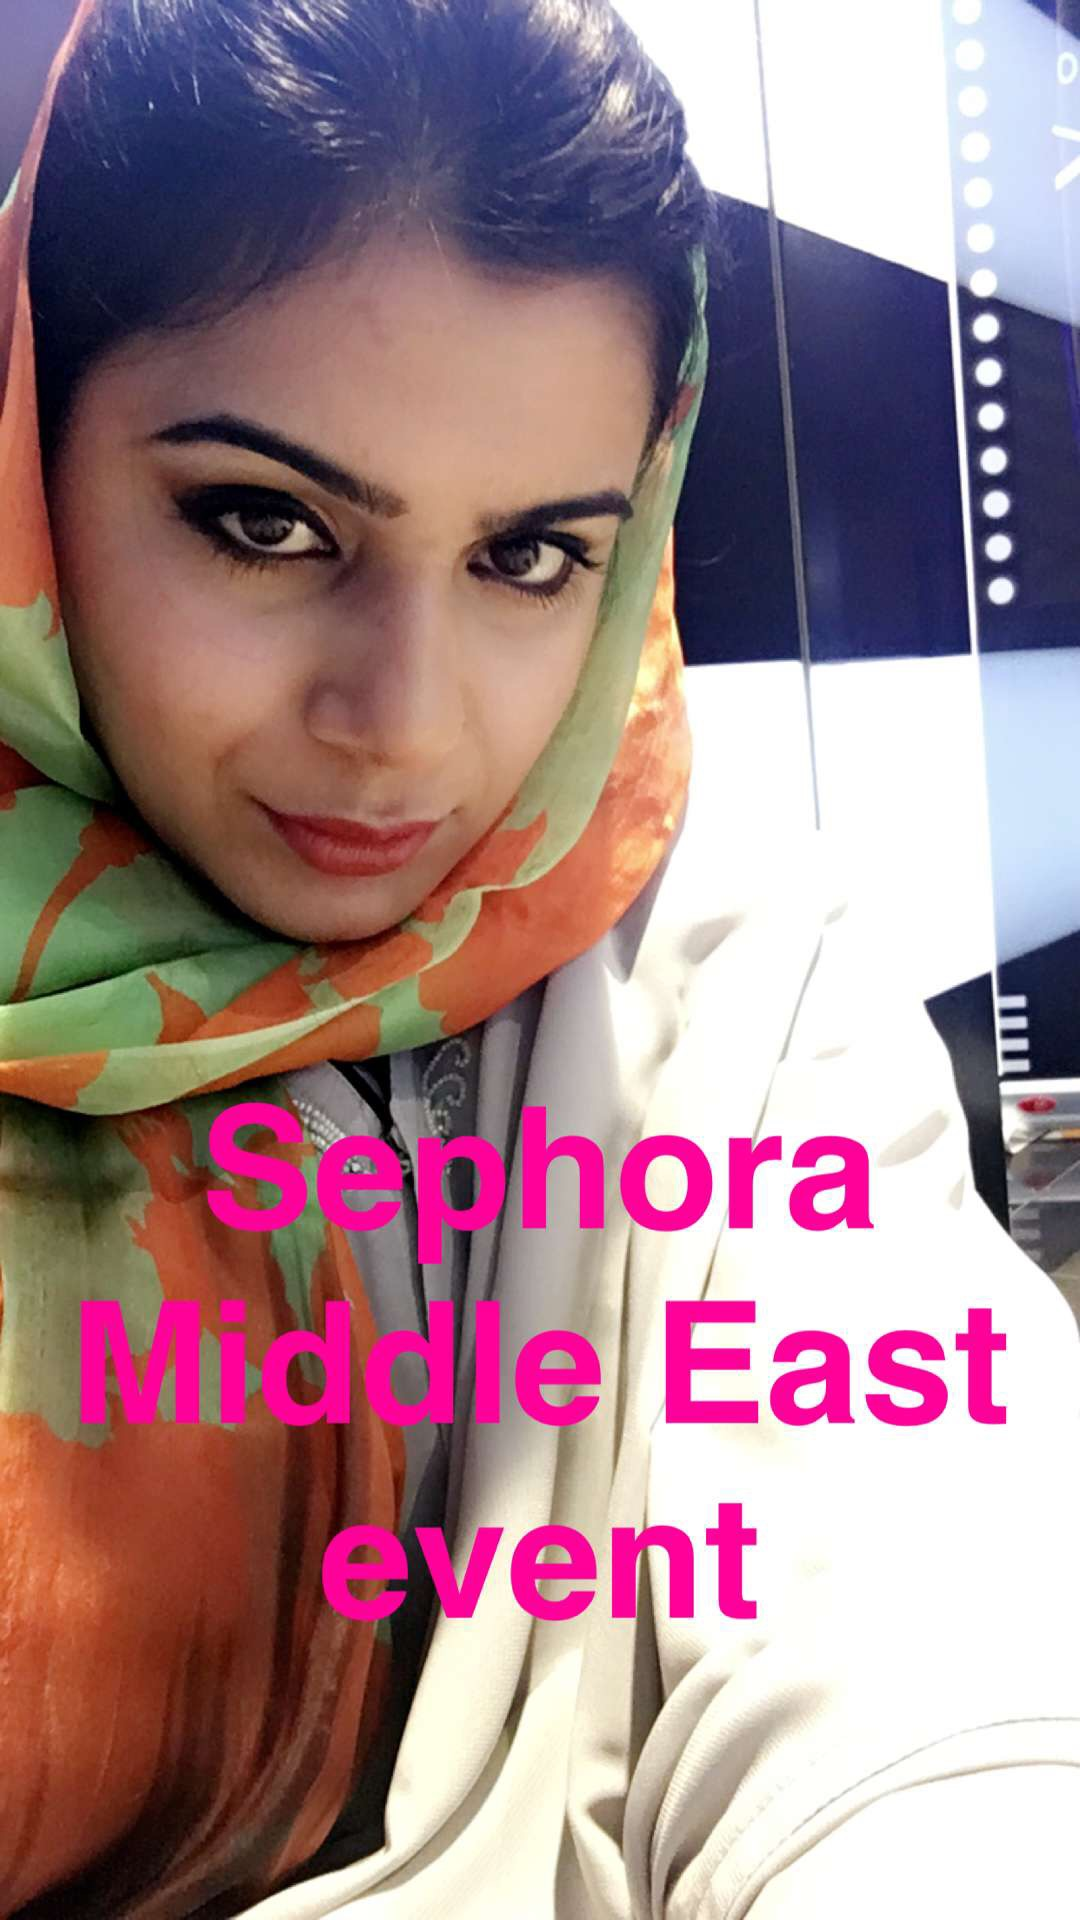 31cac7824b Sephora Makeup Action Tour Middle East – Jeddah, Saudi Arabia ...